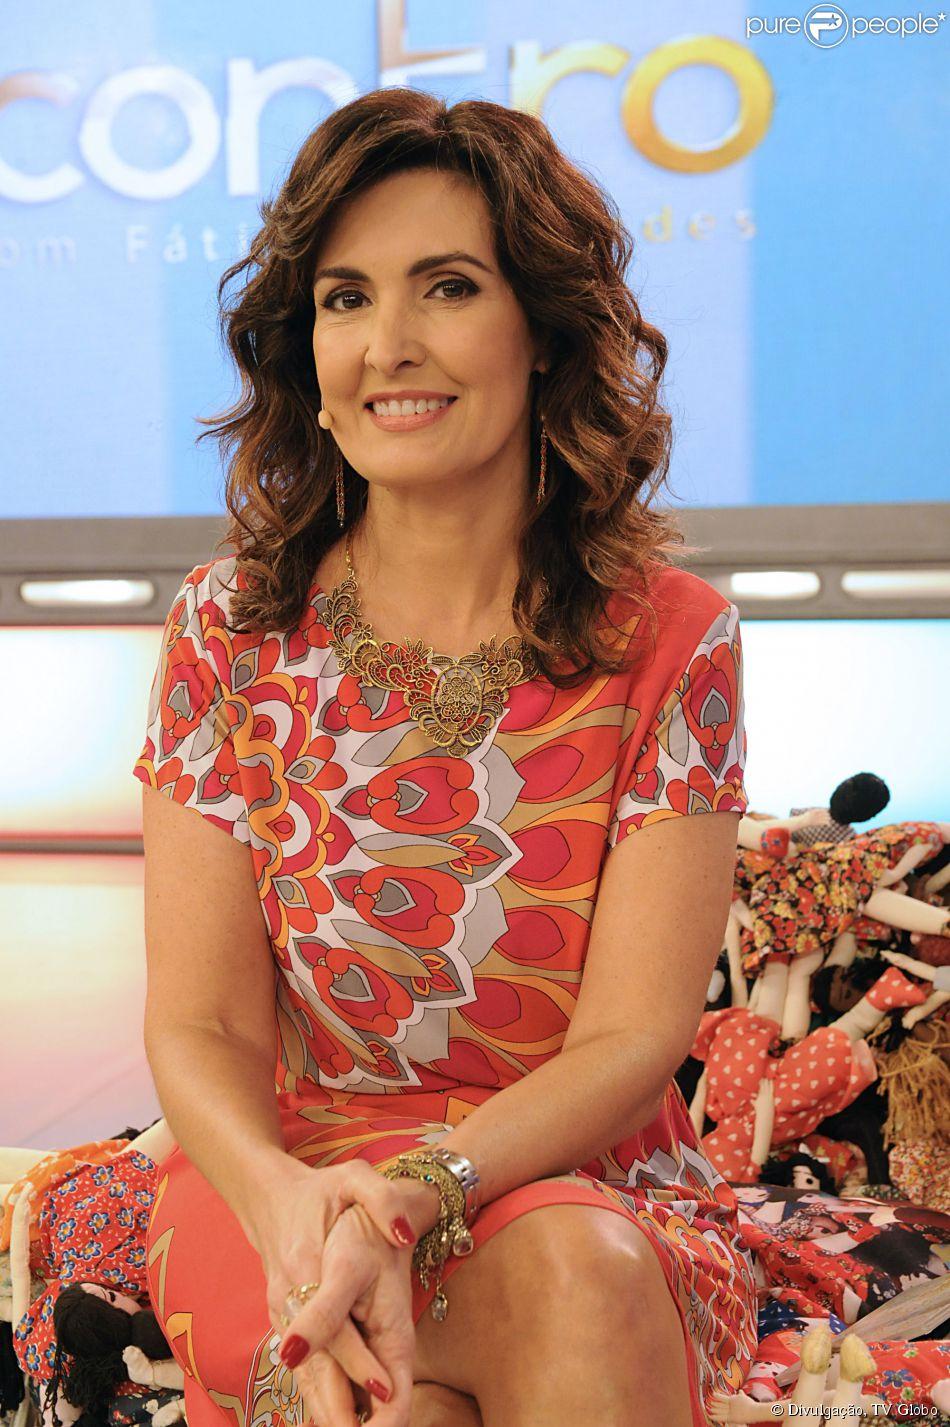 Beatriz de oliveira 2 - 1 2